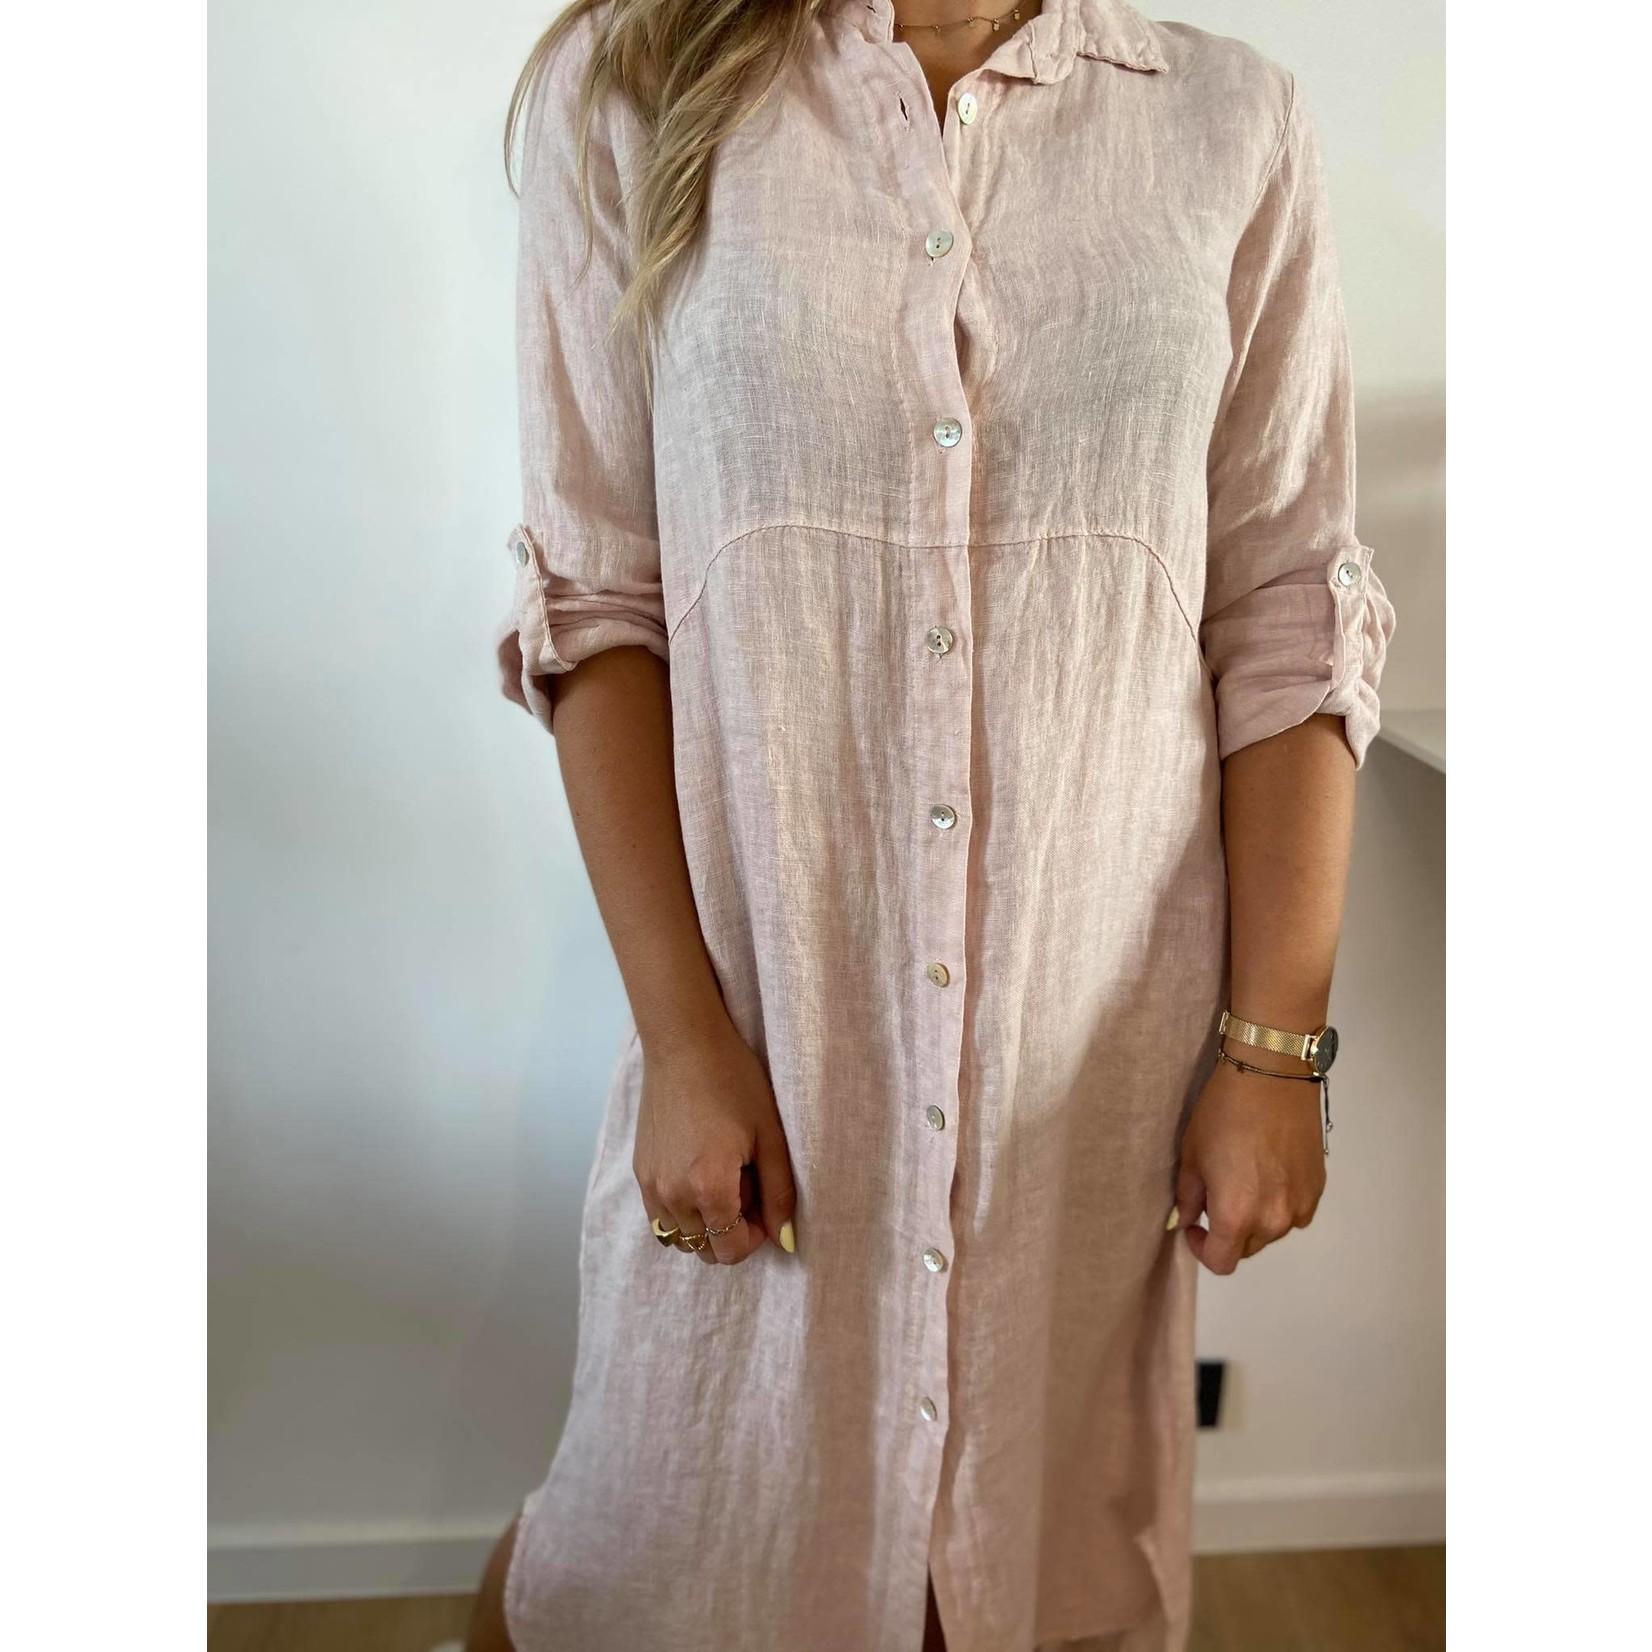 Ornella linnen dress pink TU